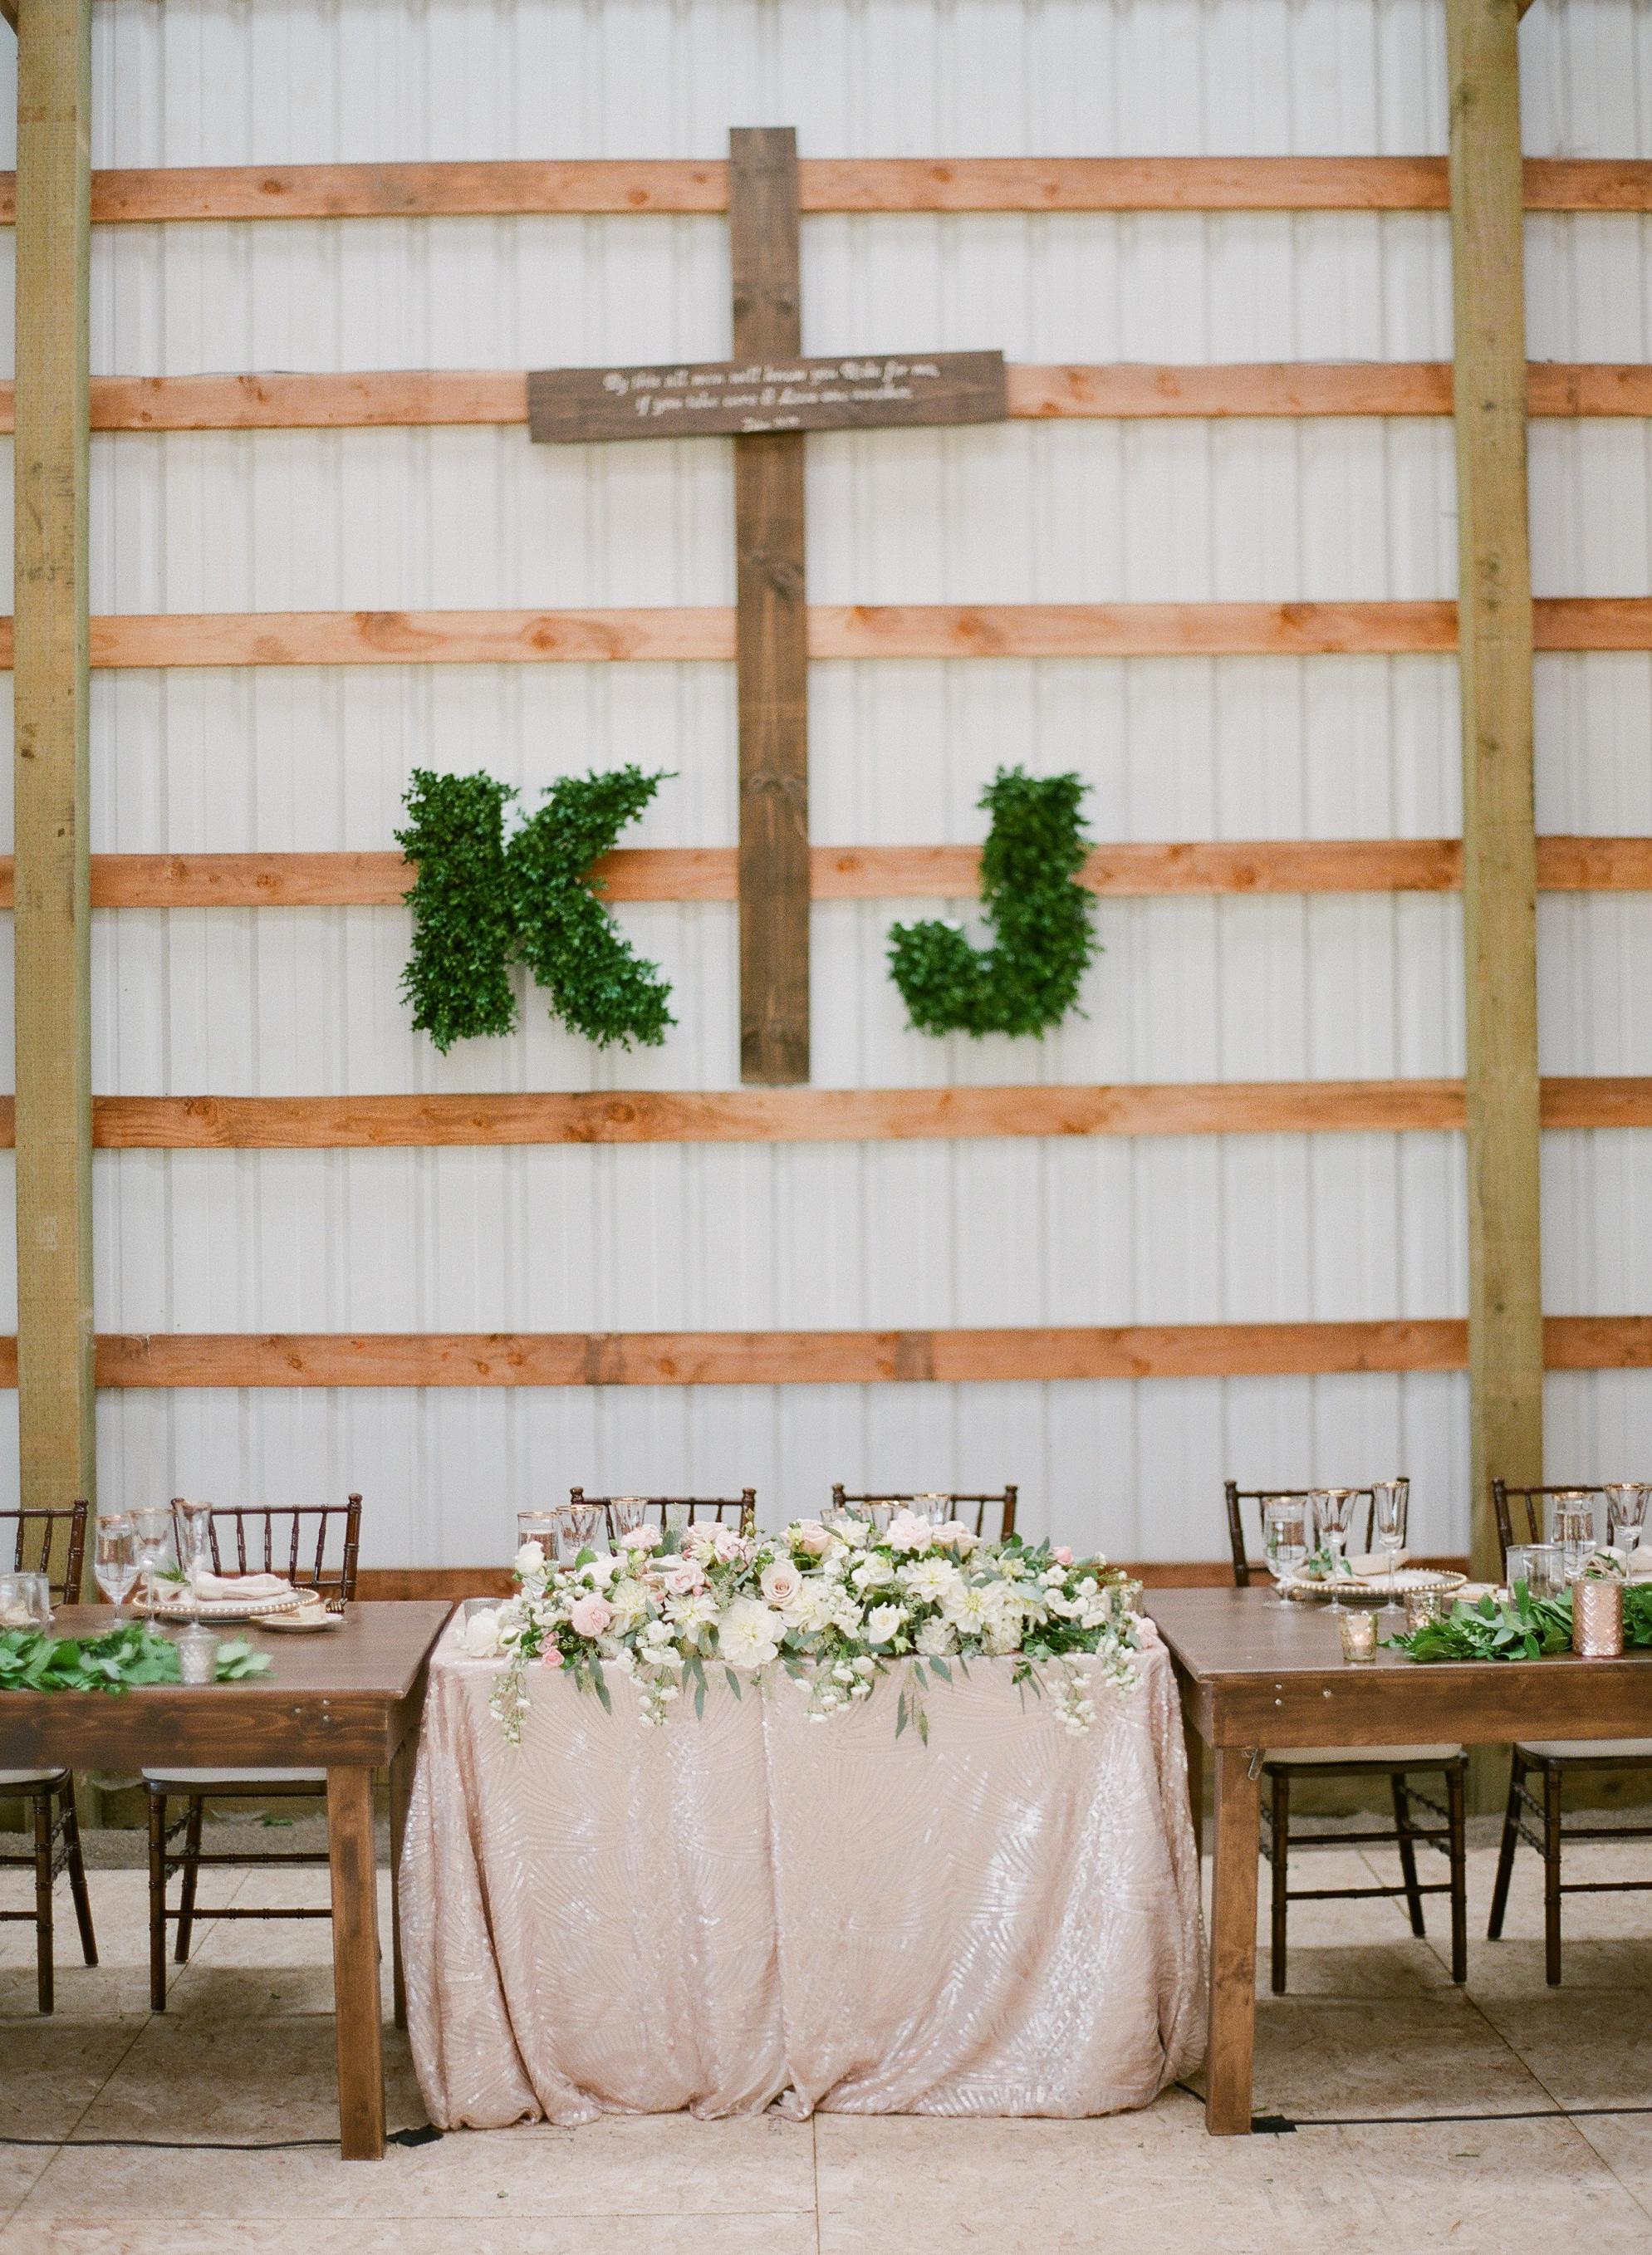 Sweeny Puncochar Wedding 08.19.17 - Simply Splendid - Bridal Bliss - 088.jpg